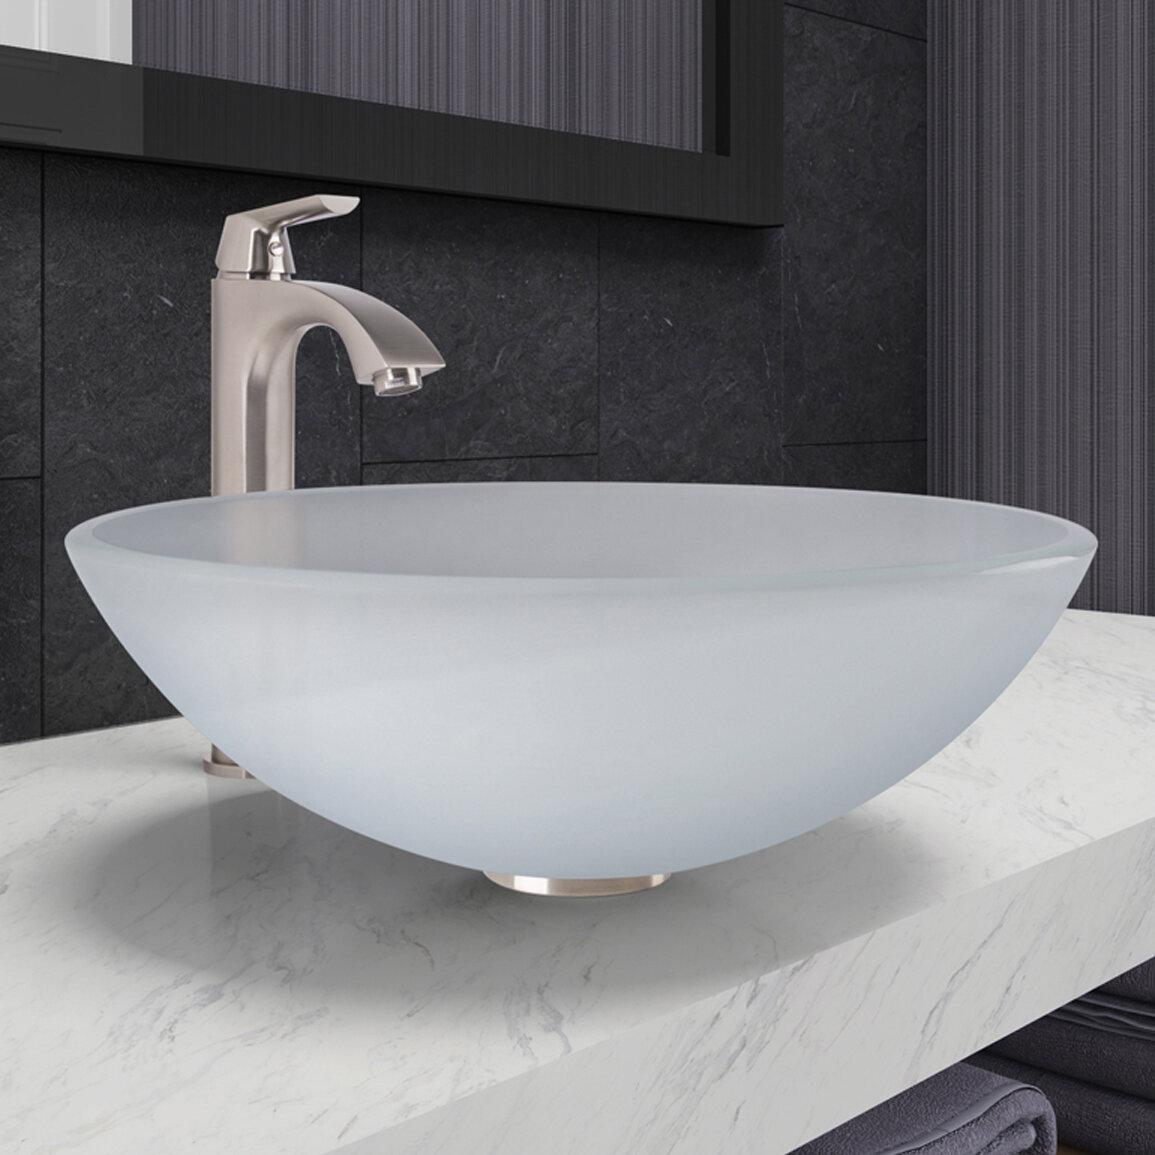 VIGO Tempered Glass Circular Vessel Bathroom Sink with Faucet ...